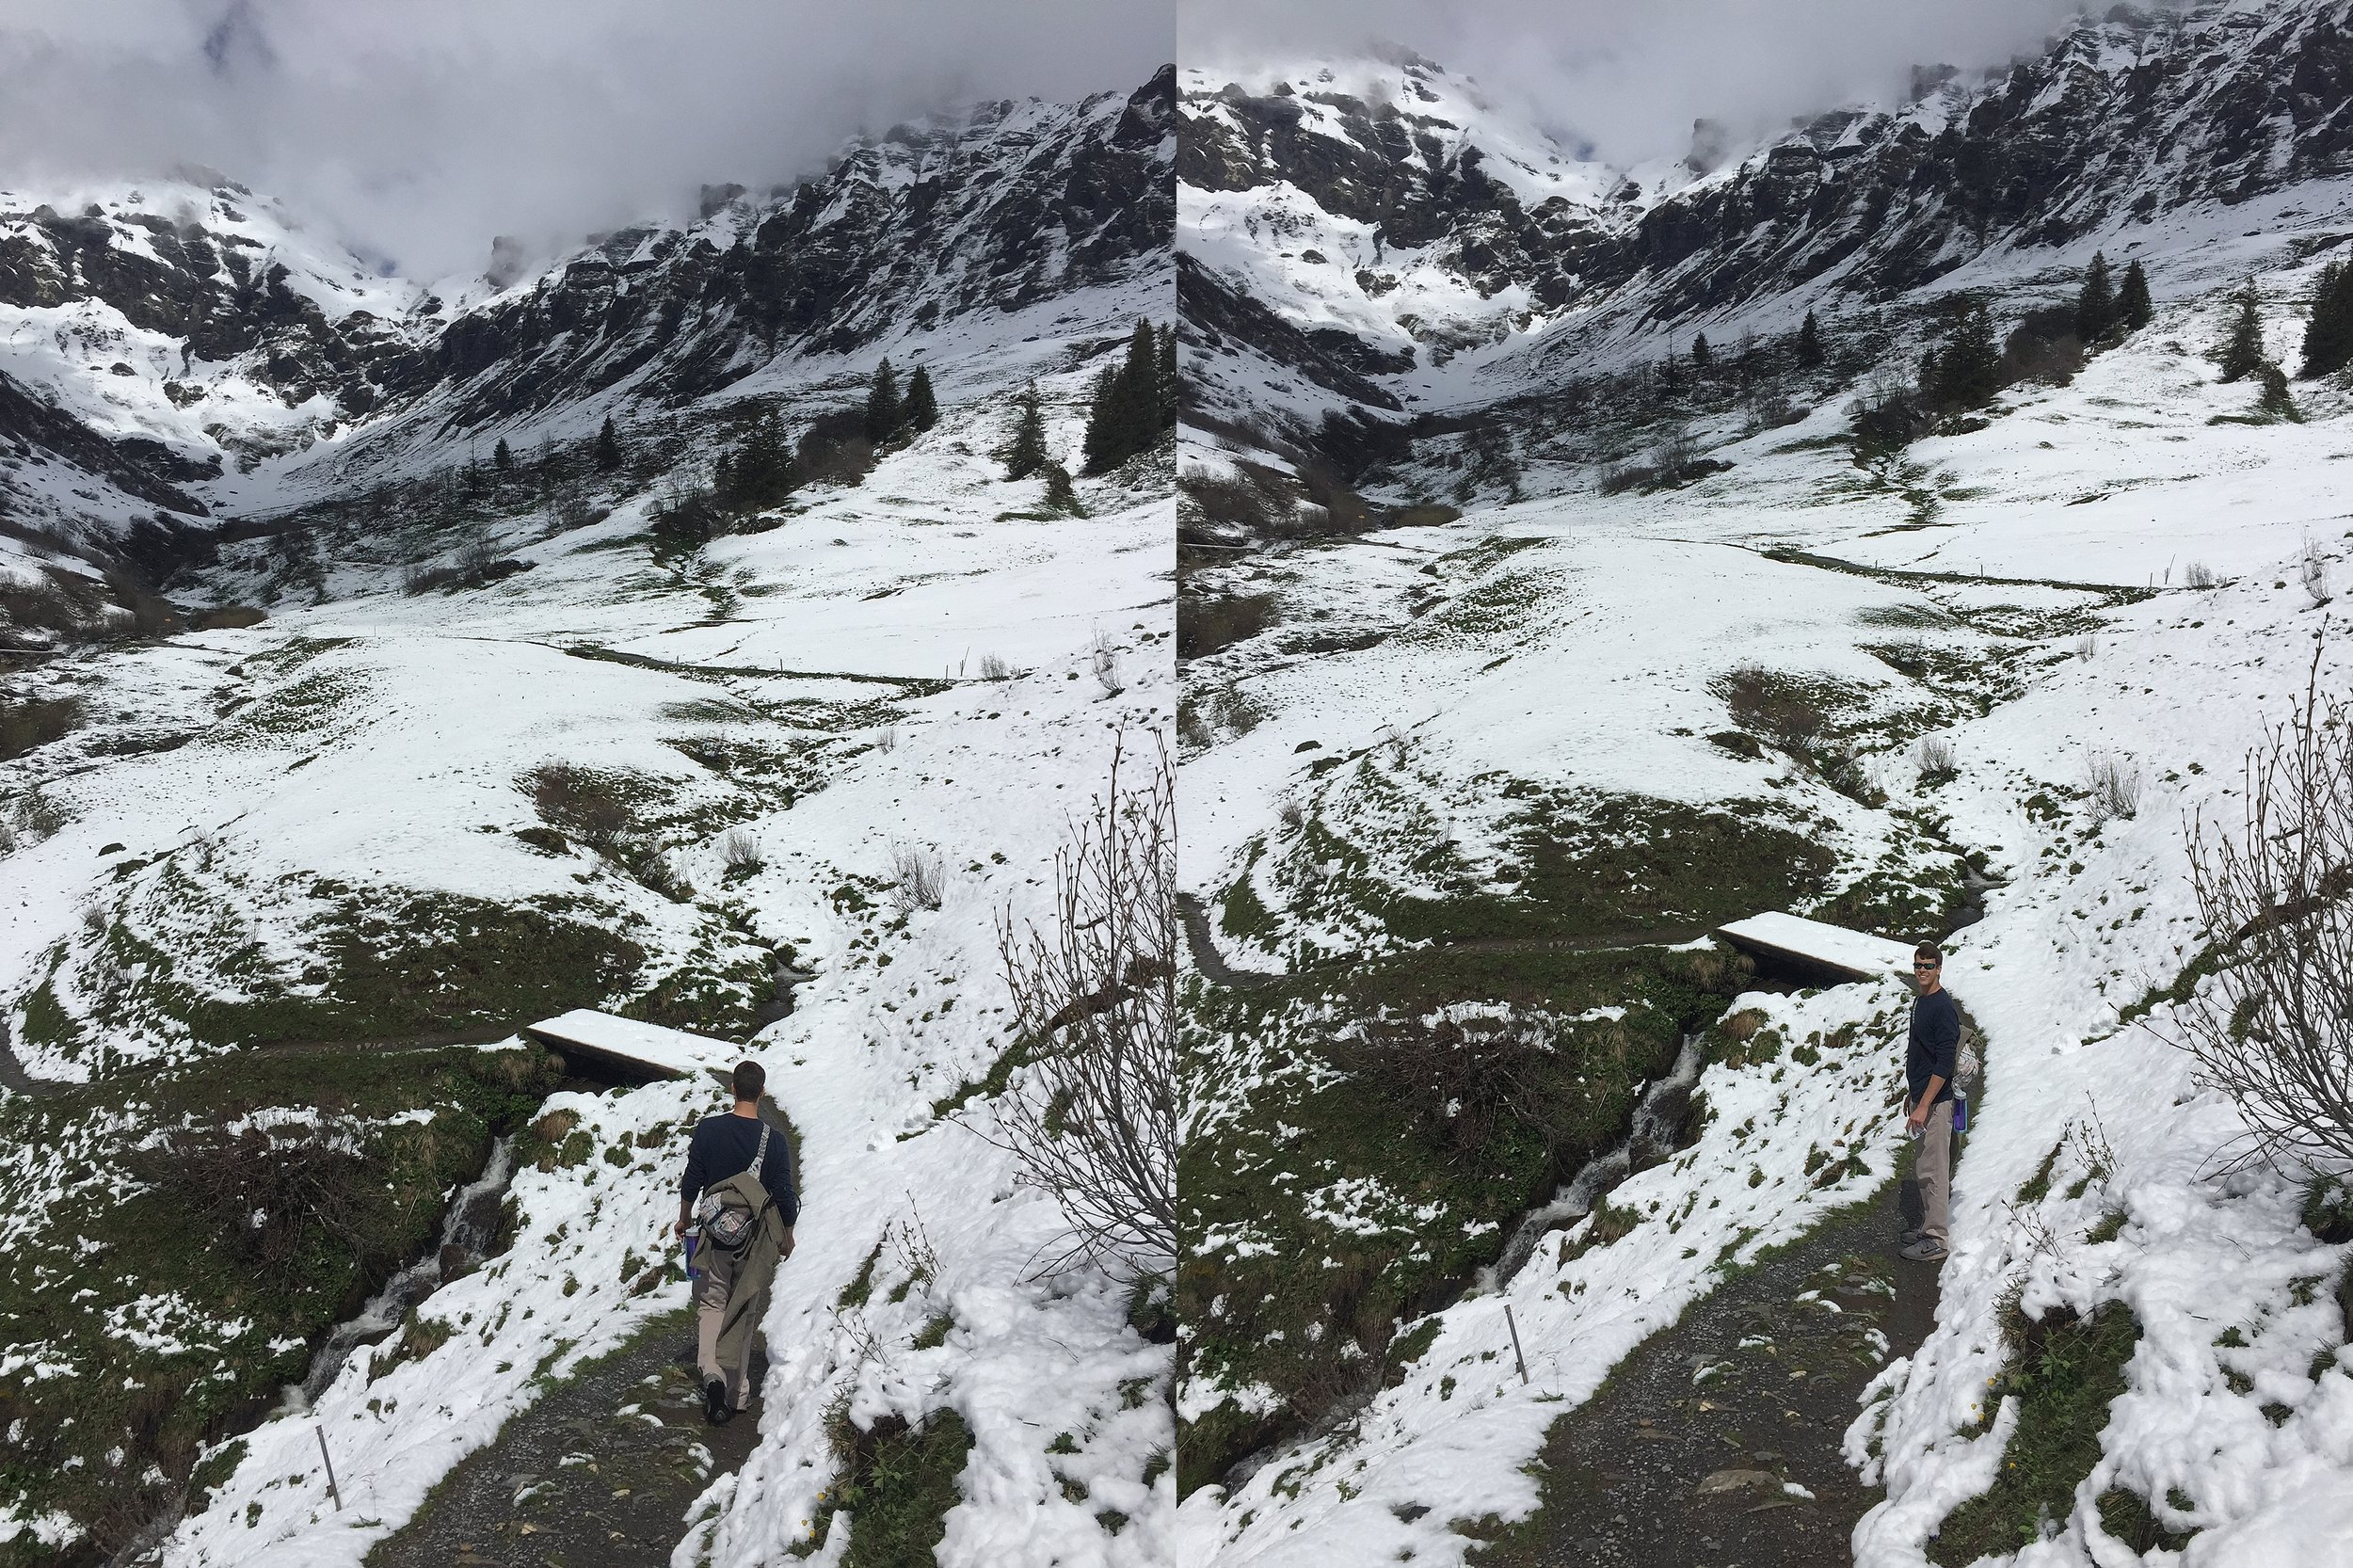 North Face Trail_0007.jpg